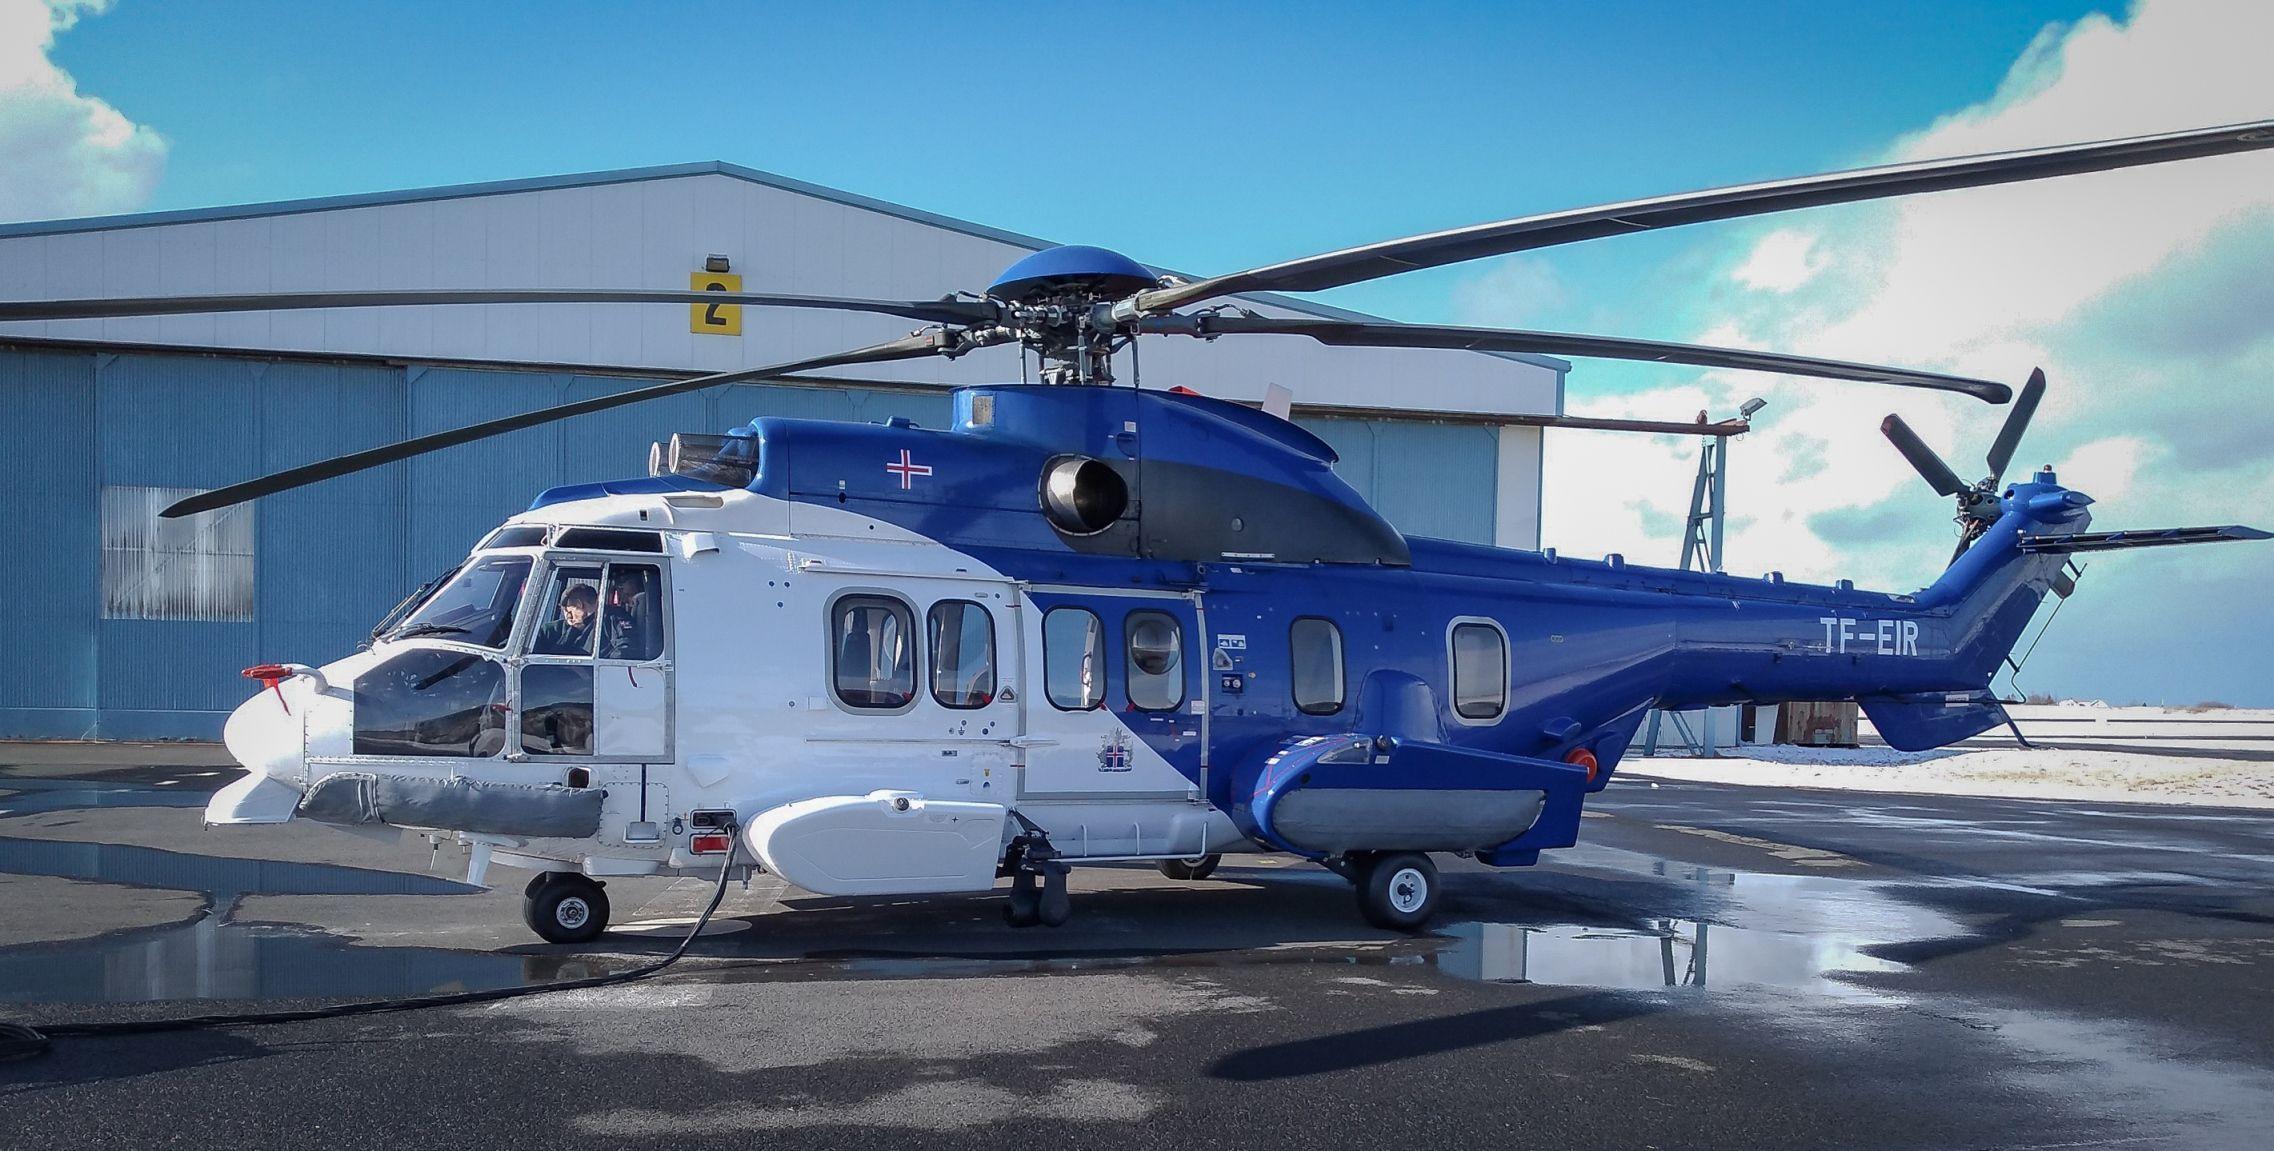 Un hélicoptère d'Airbus. Credit photo : Airbus.